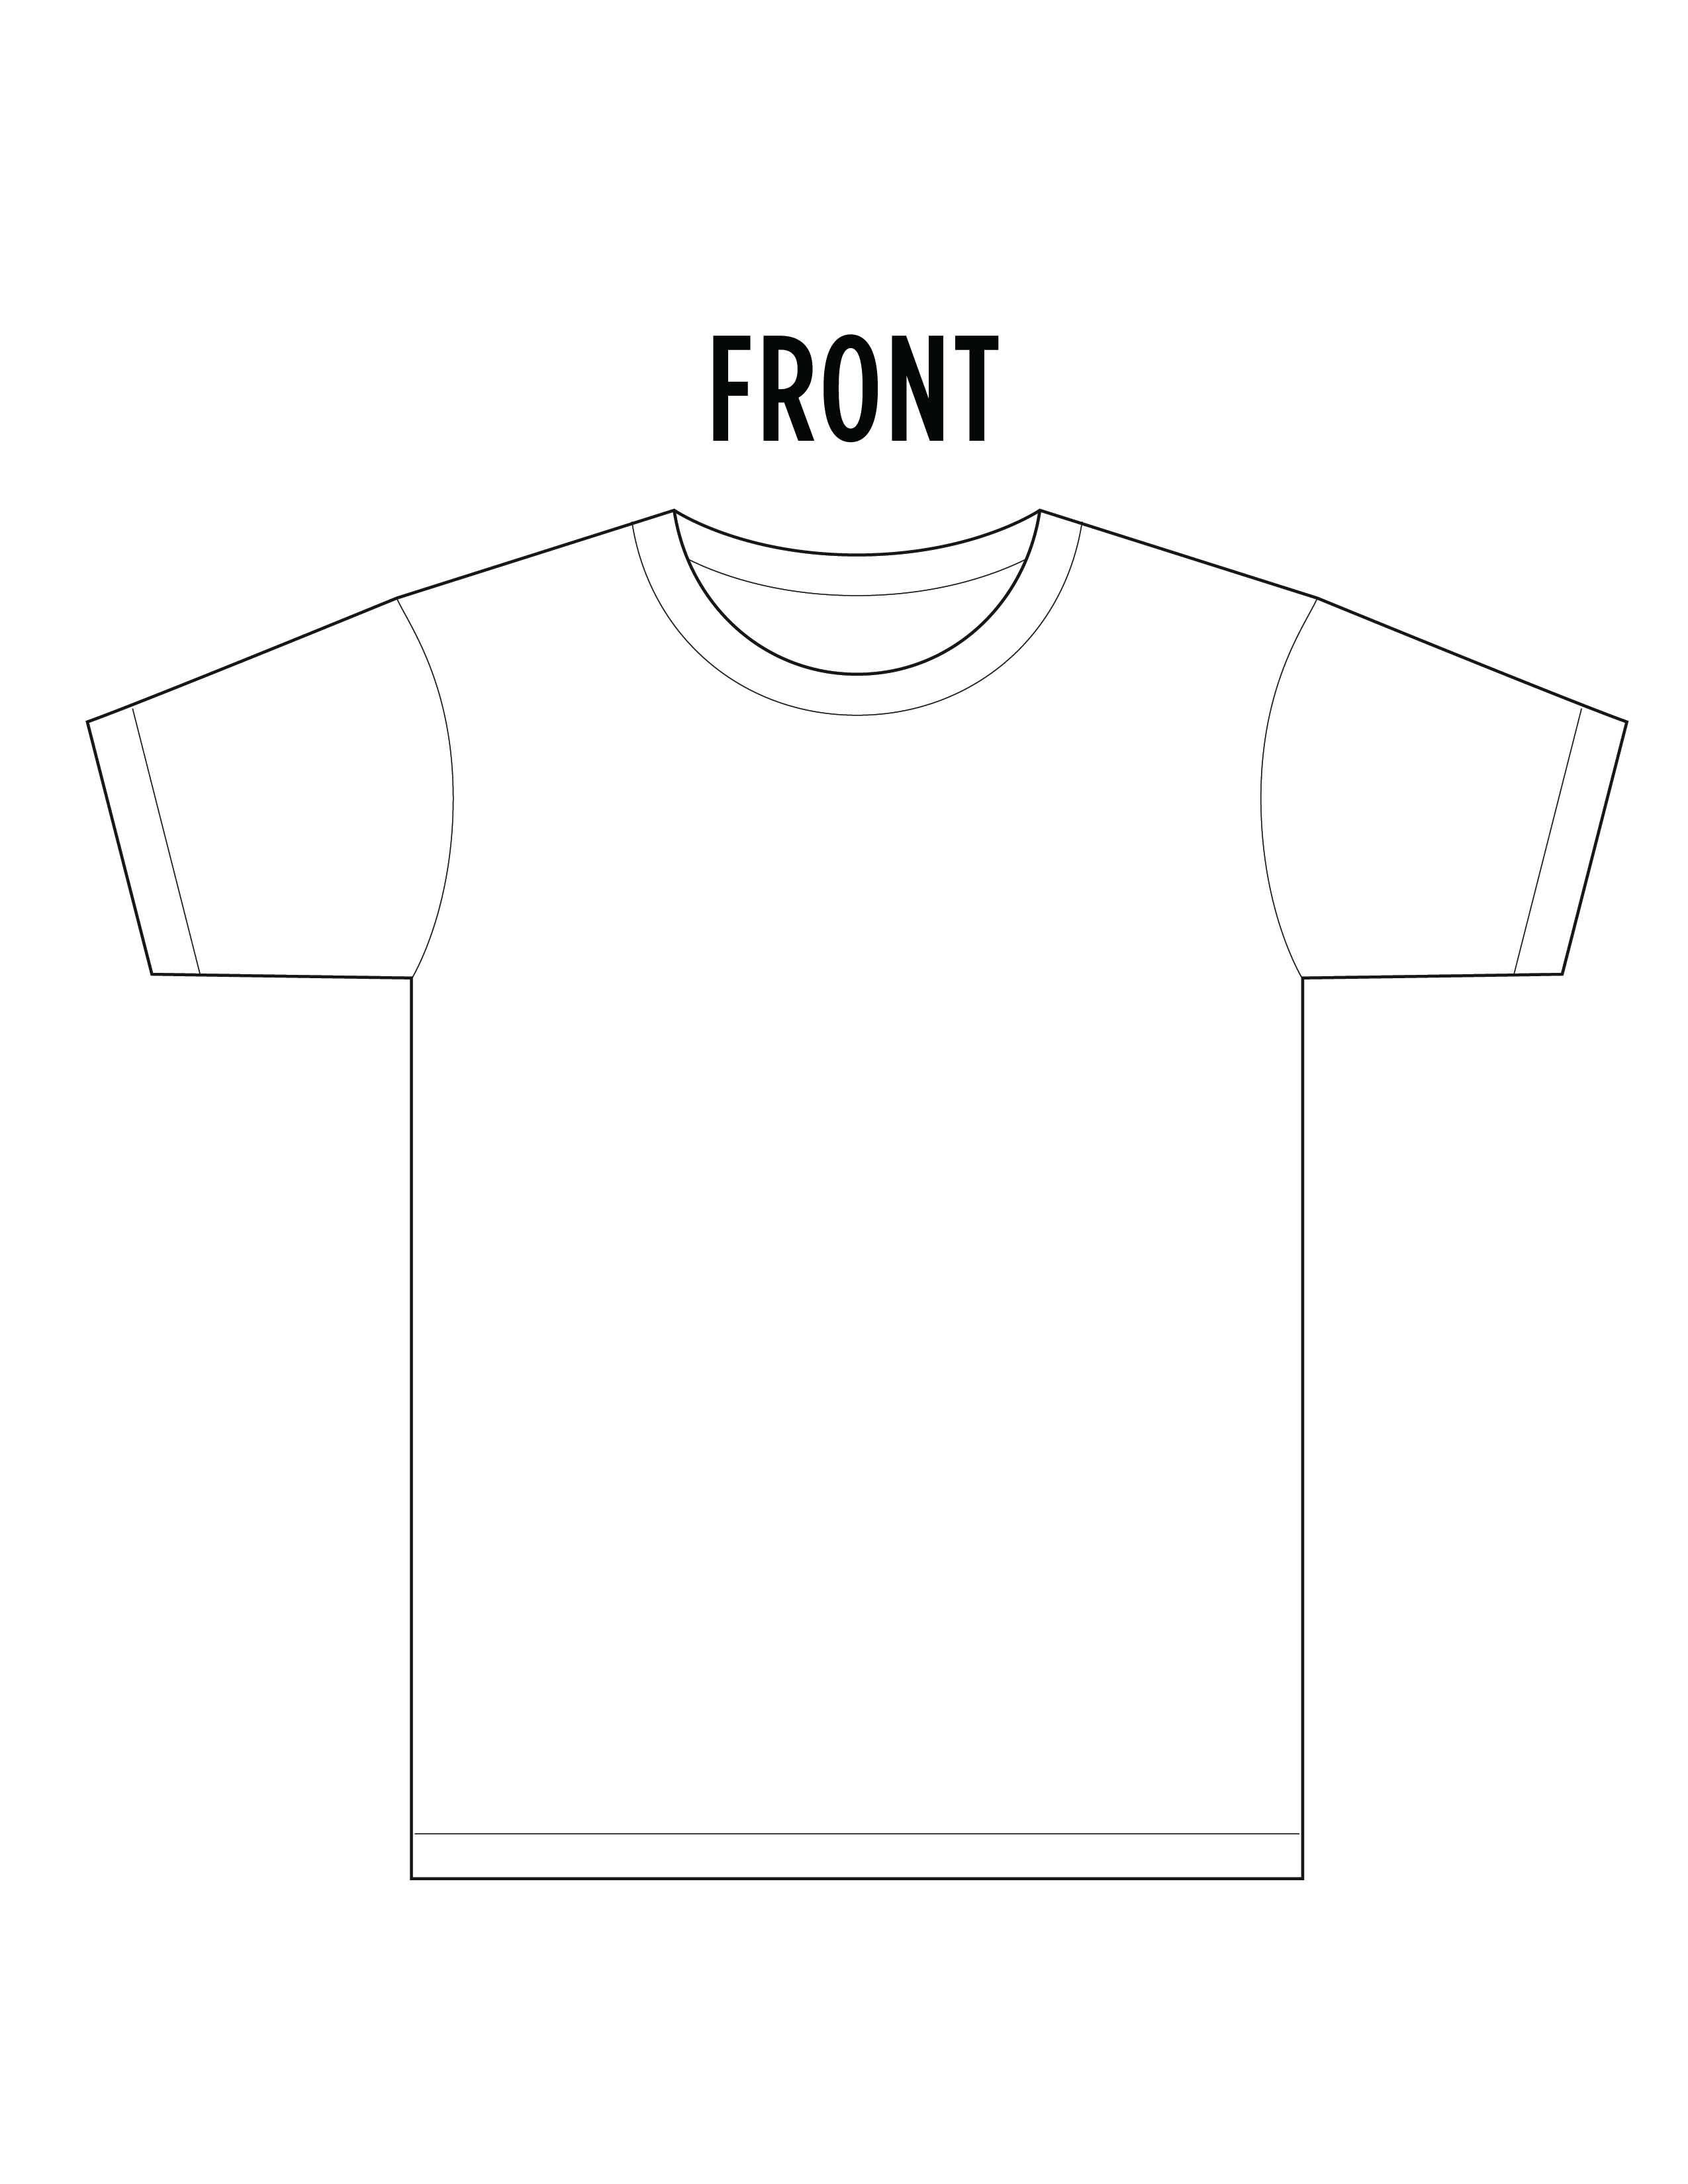 Niedlich Shirt Illustrator Vorlage Fotos - Entry Level Resume ...